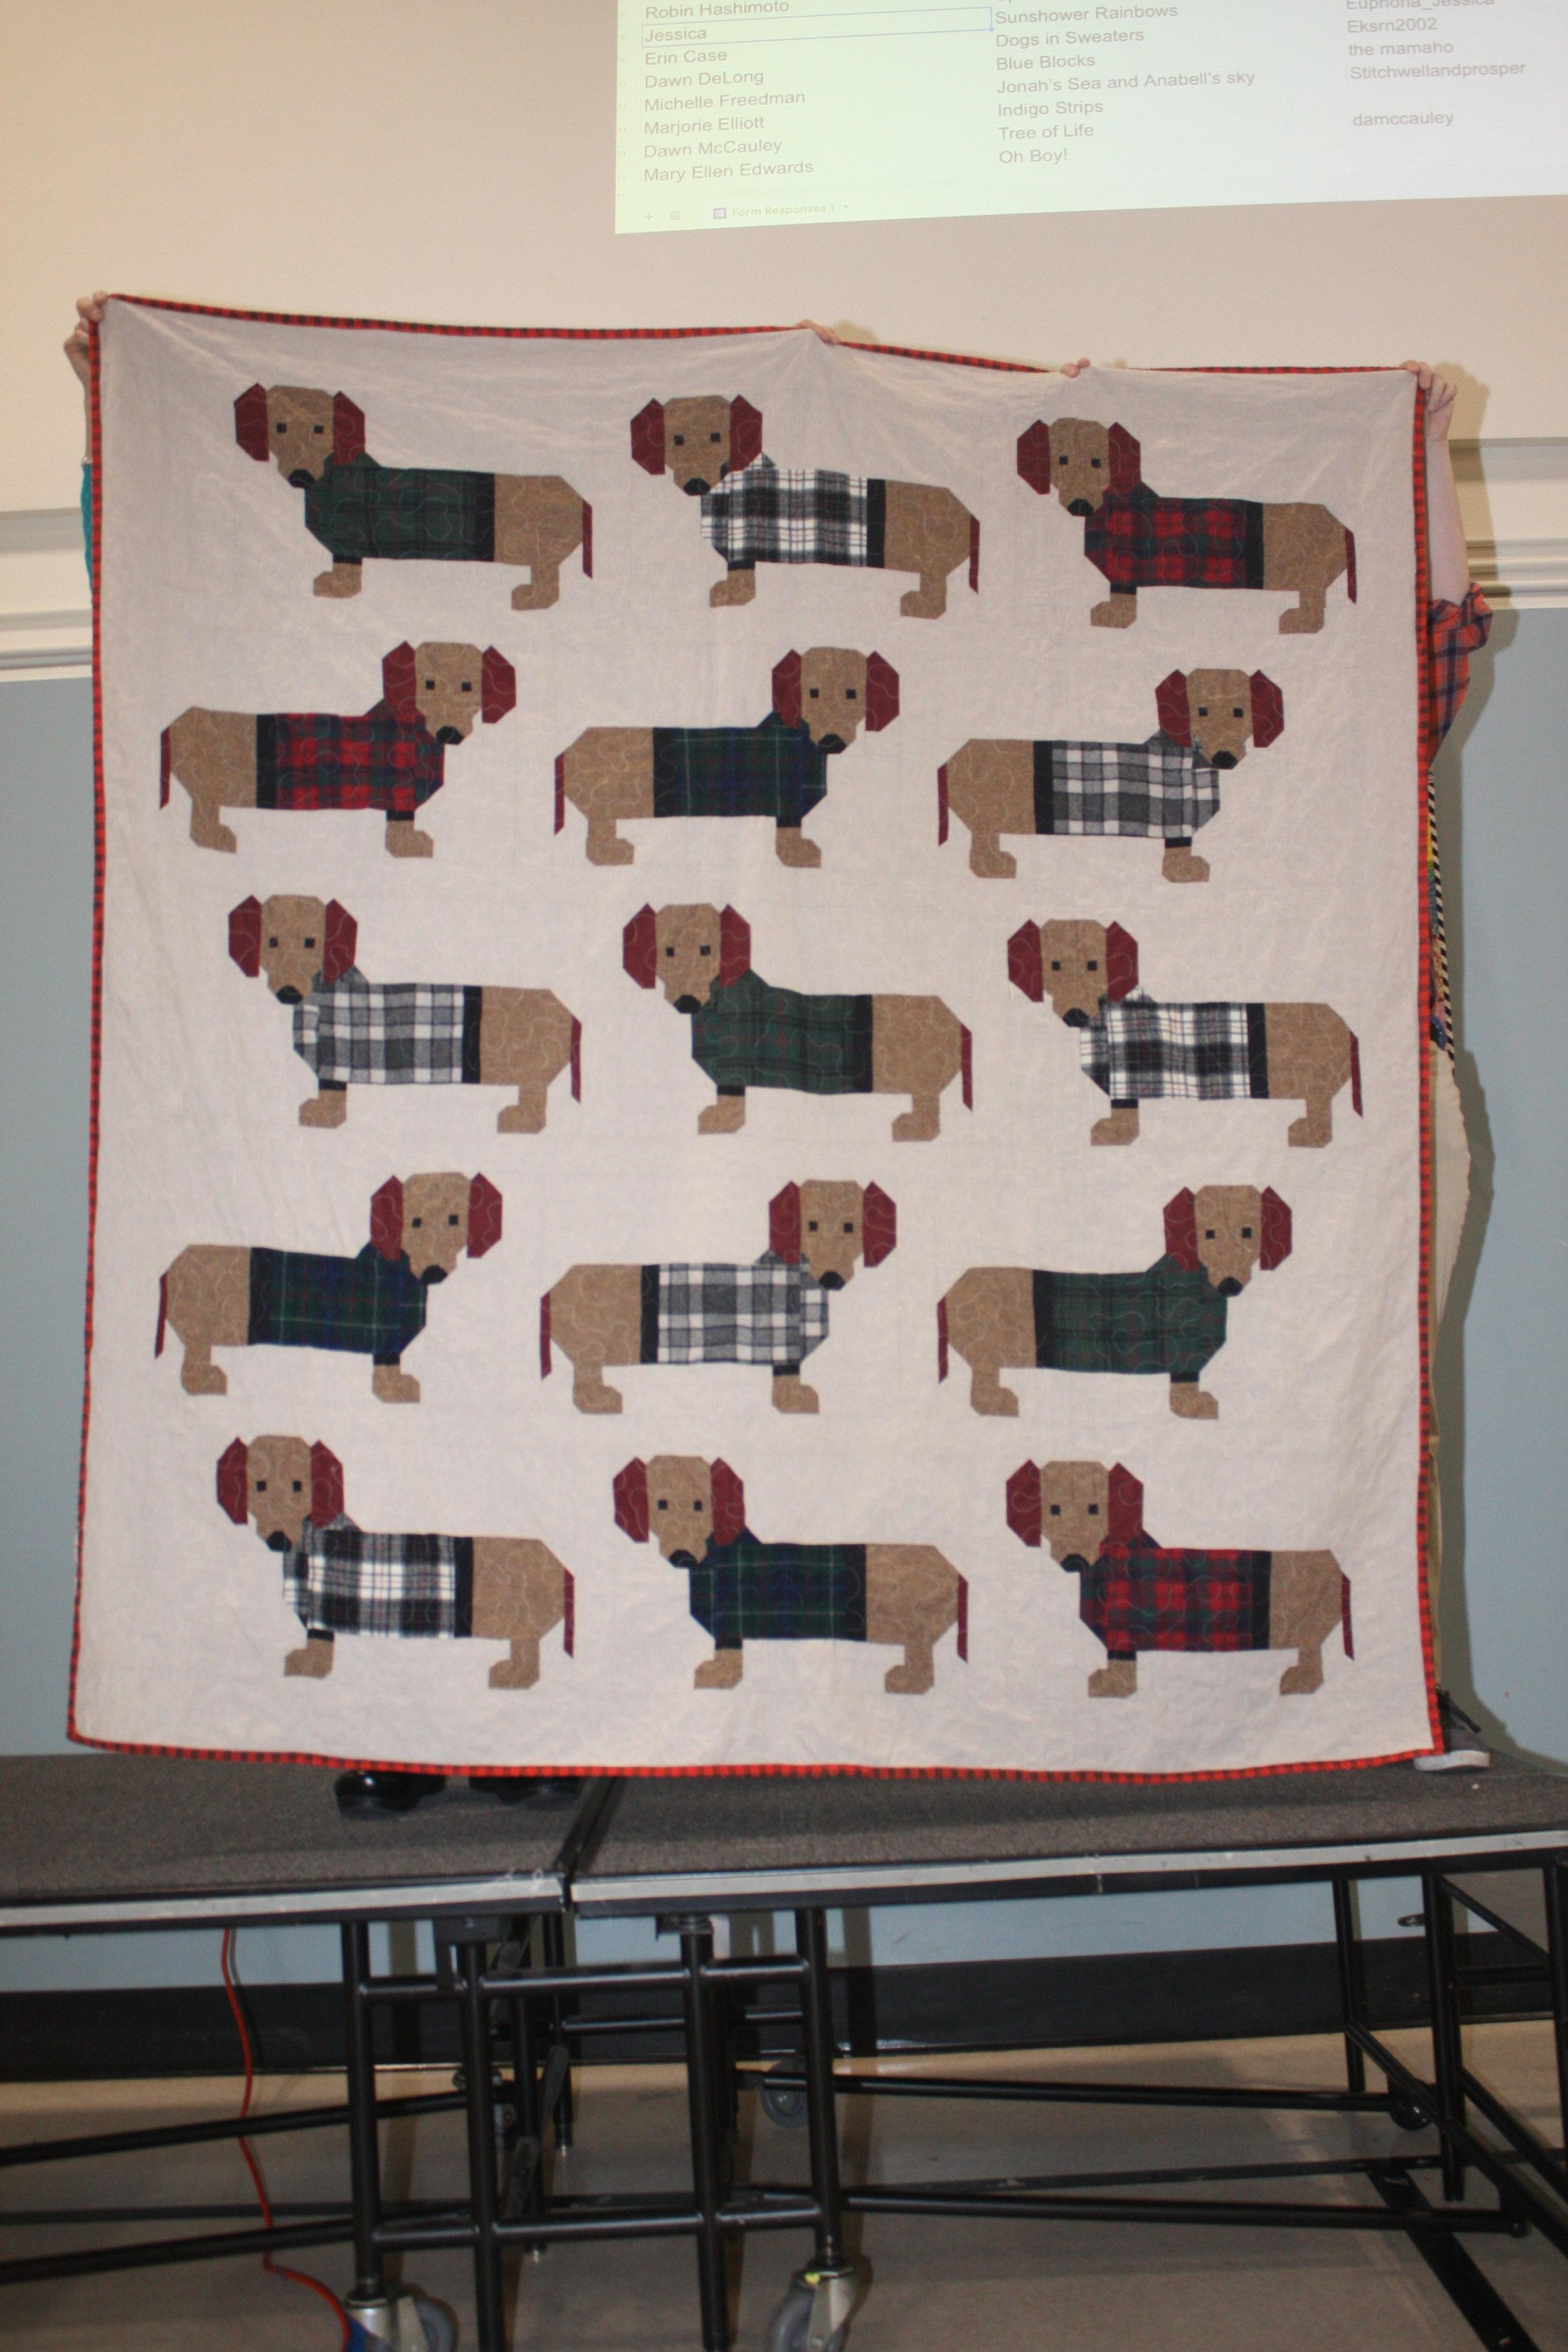 Dogs in Sweaters by Erin Case